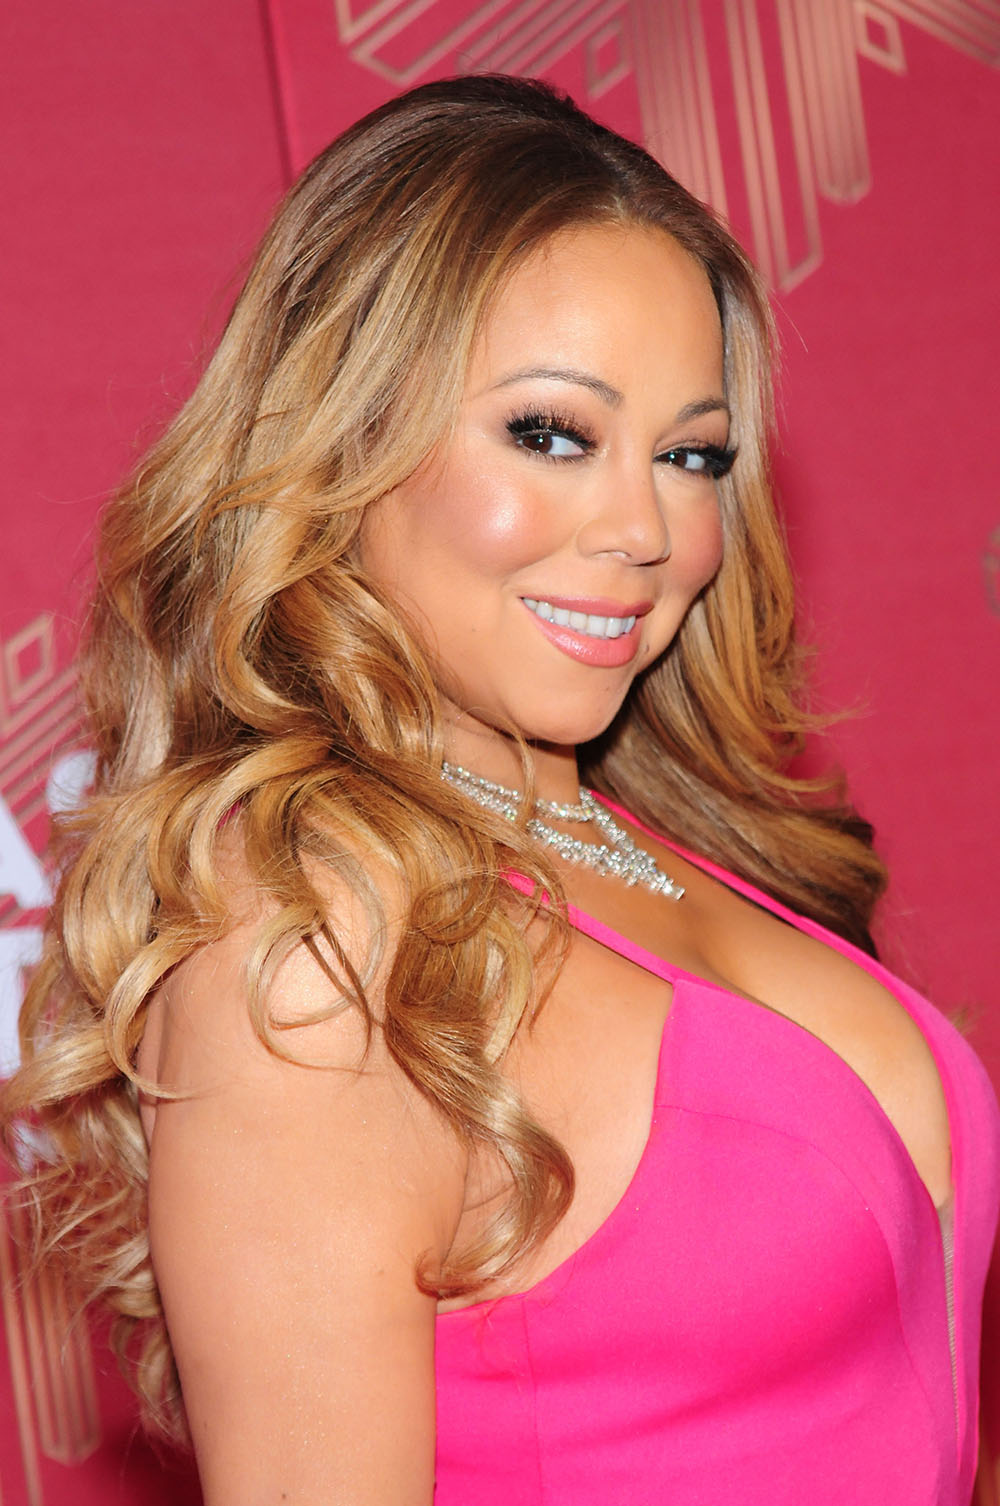 Cele bitchy mariah carey s new boyfriend gushes about - Mariah carey diva ...